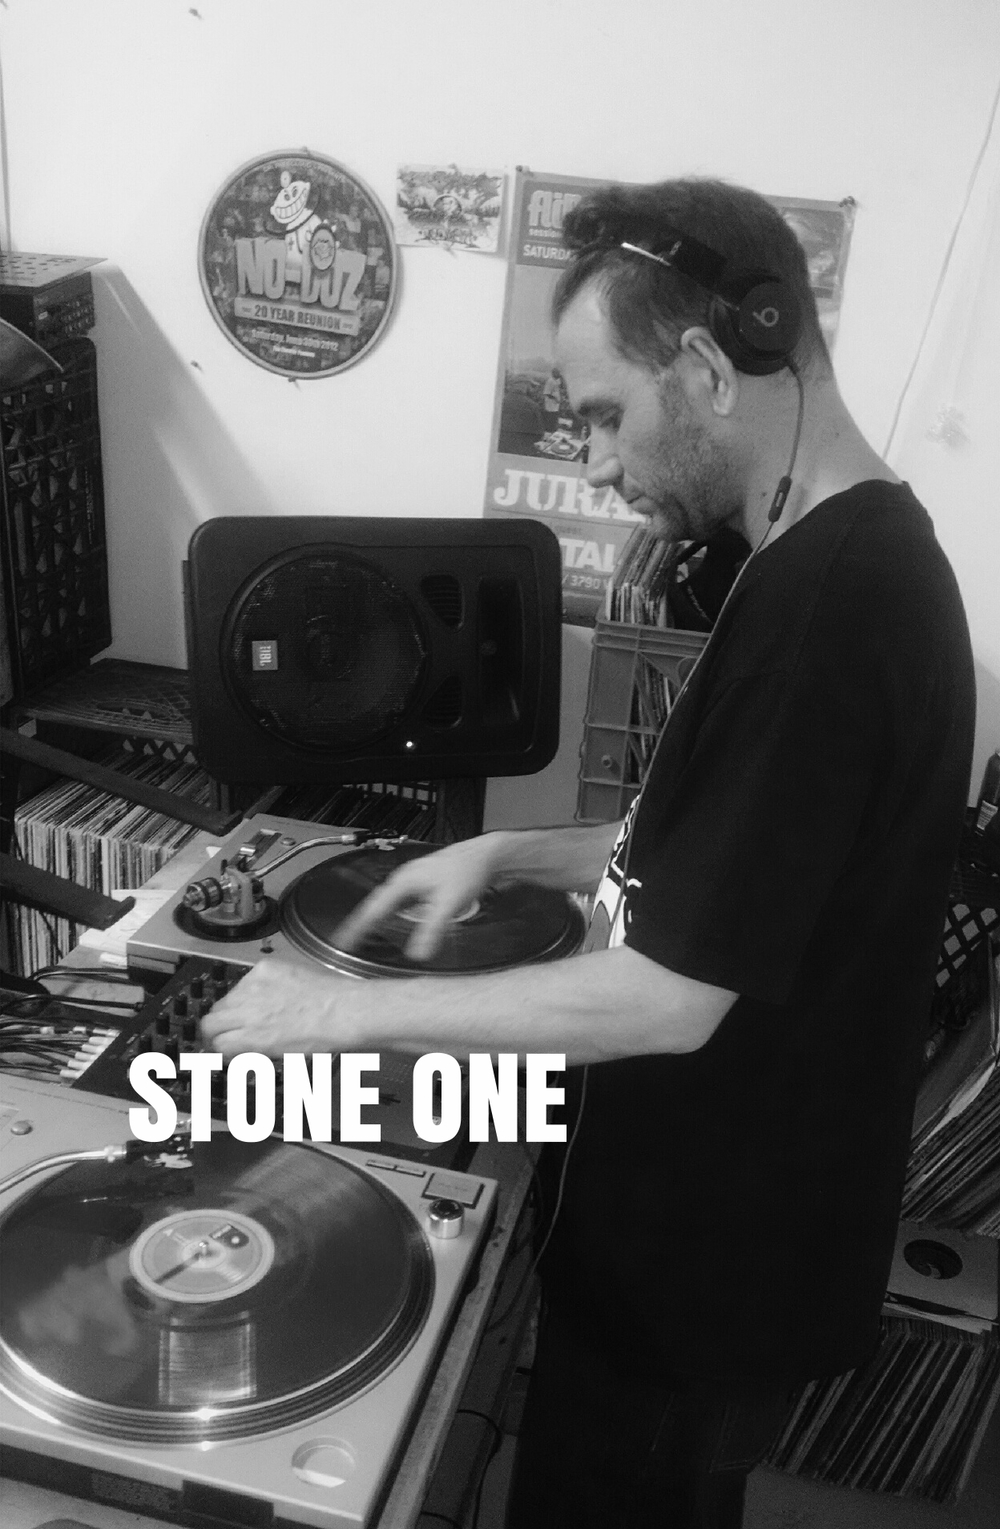 STONE ONE